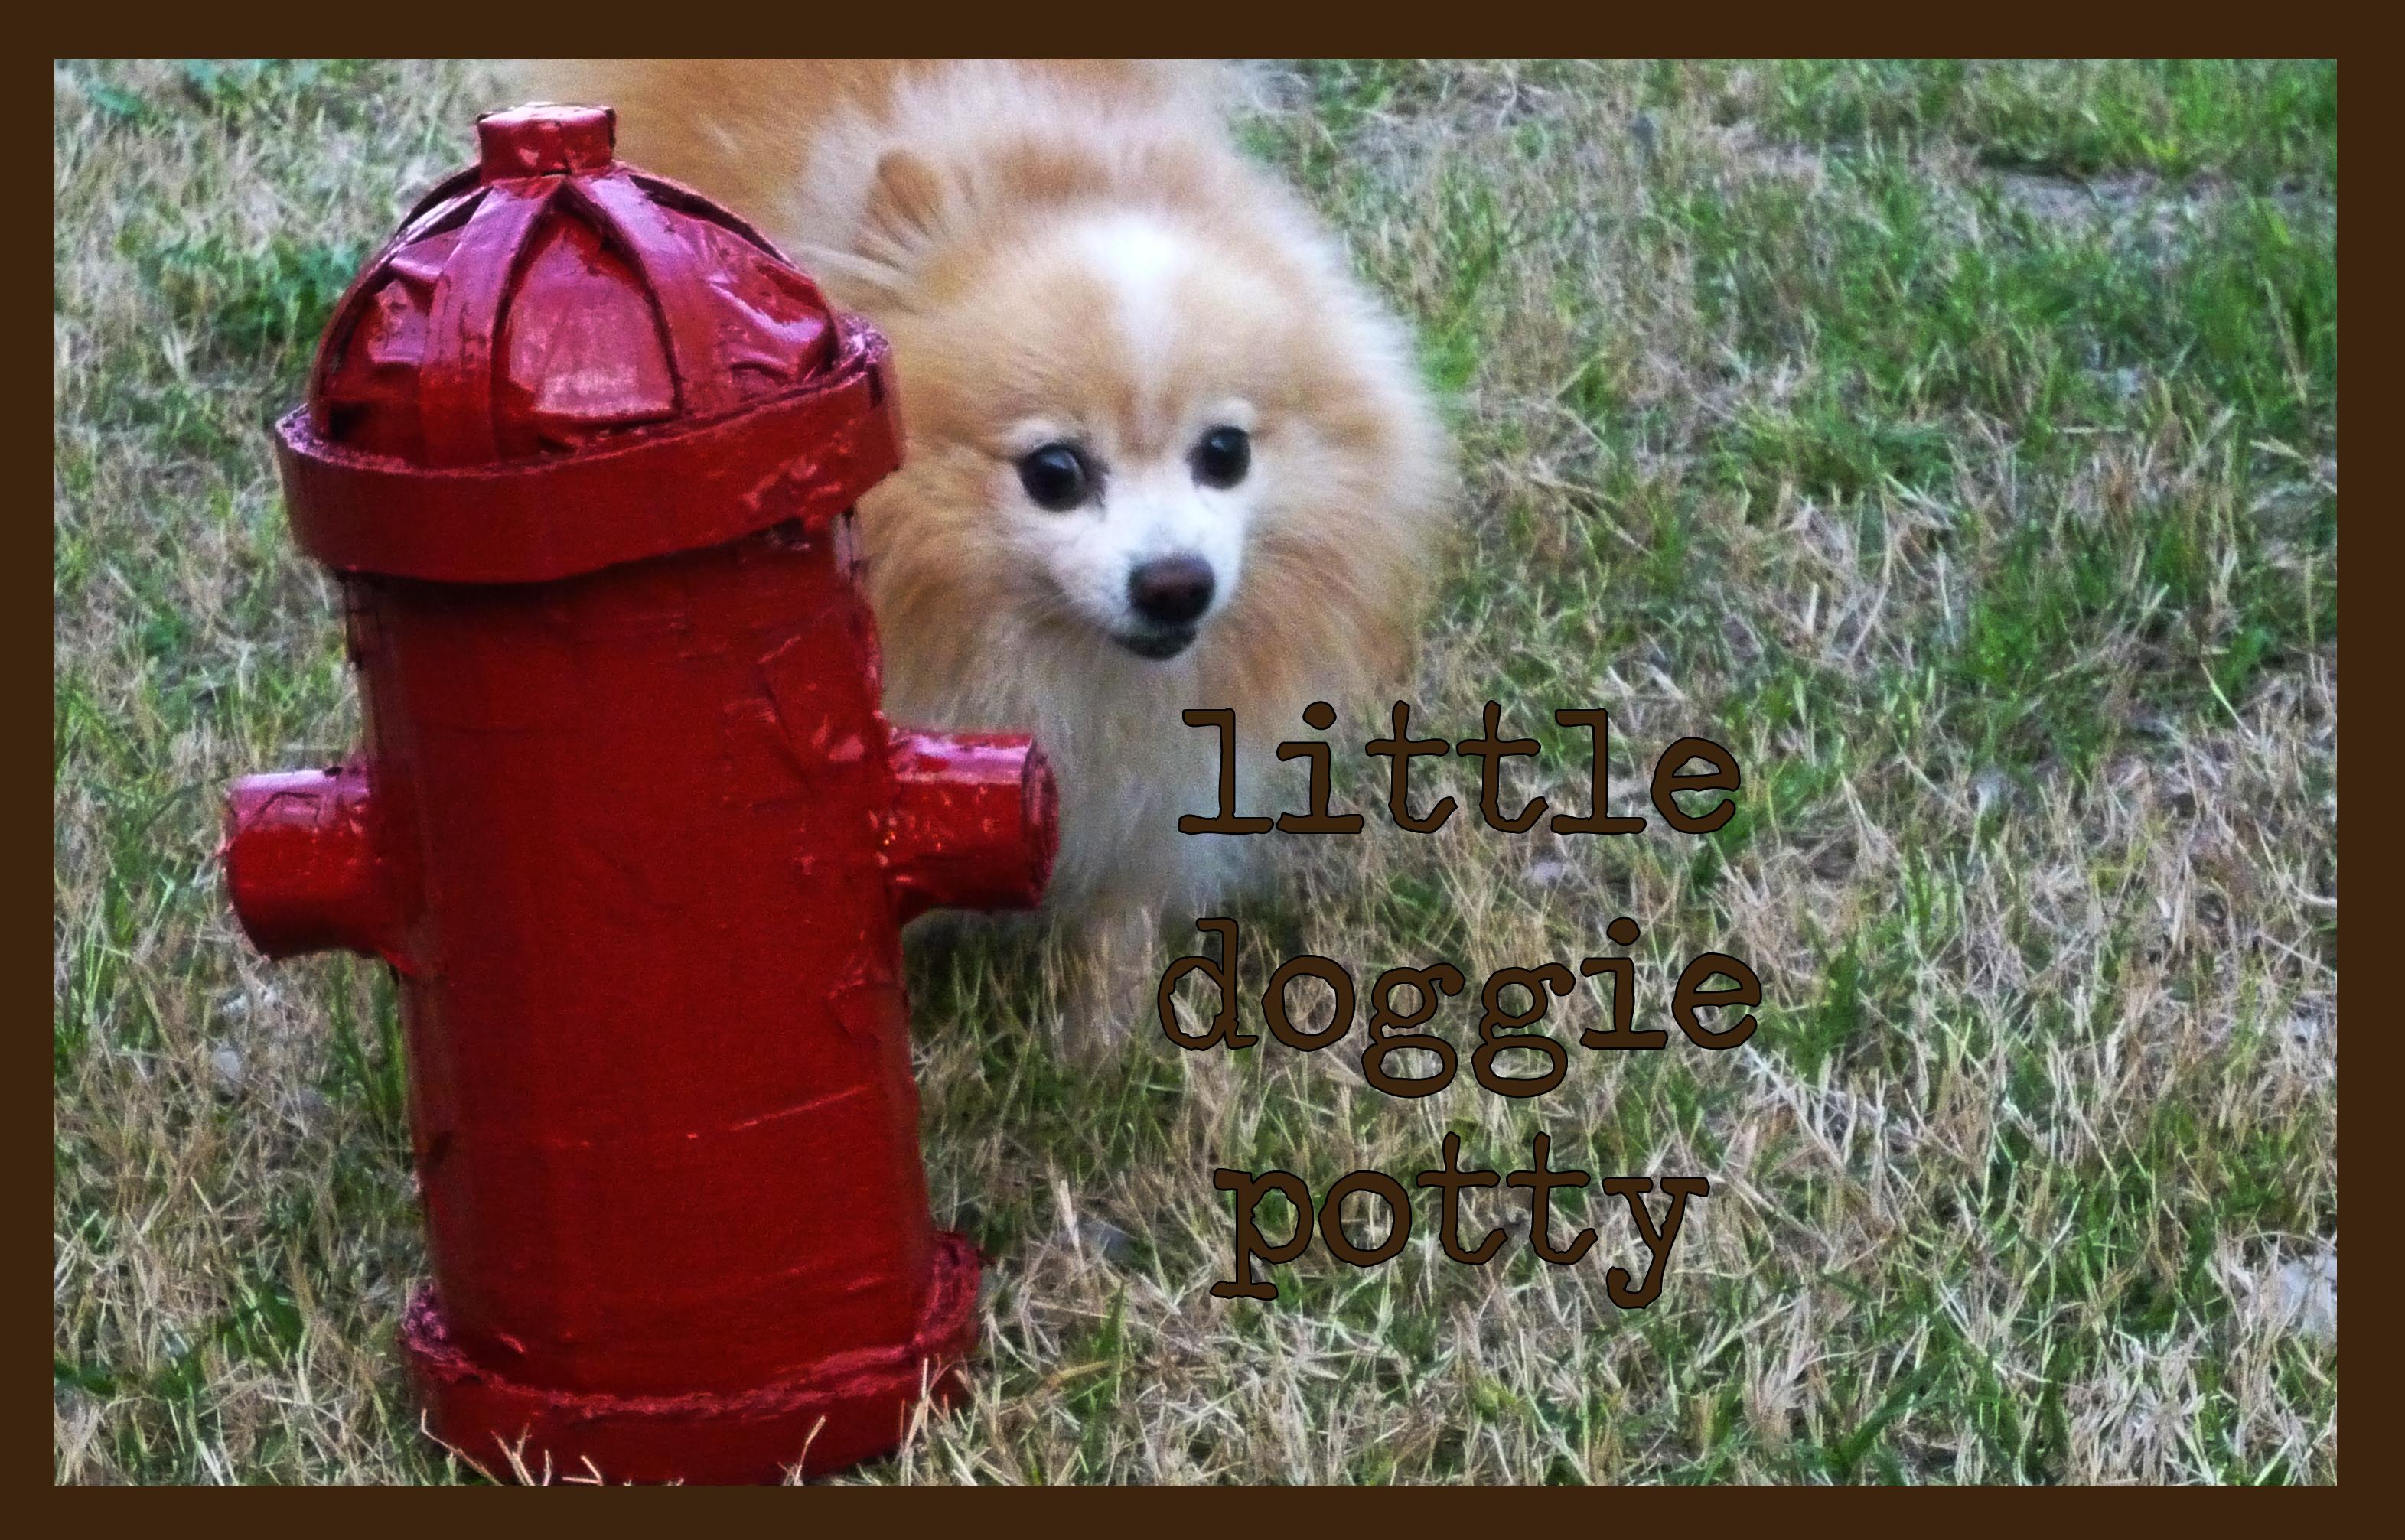 Little Doggie Potty